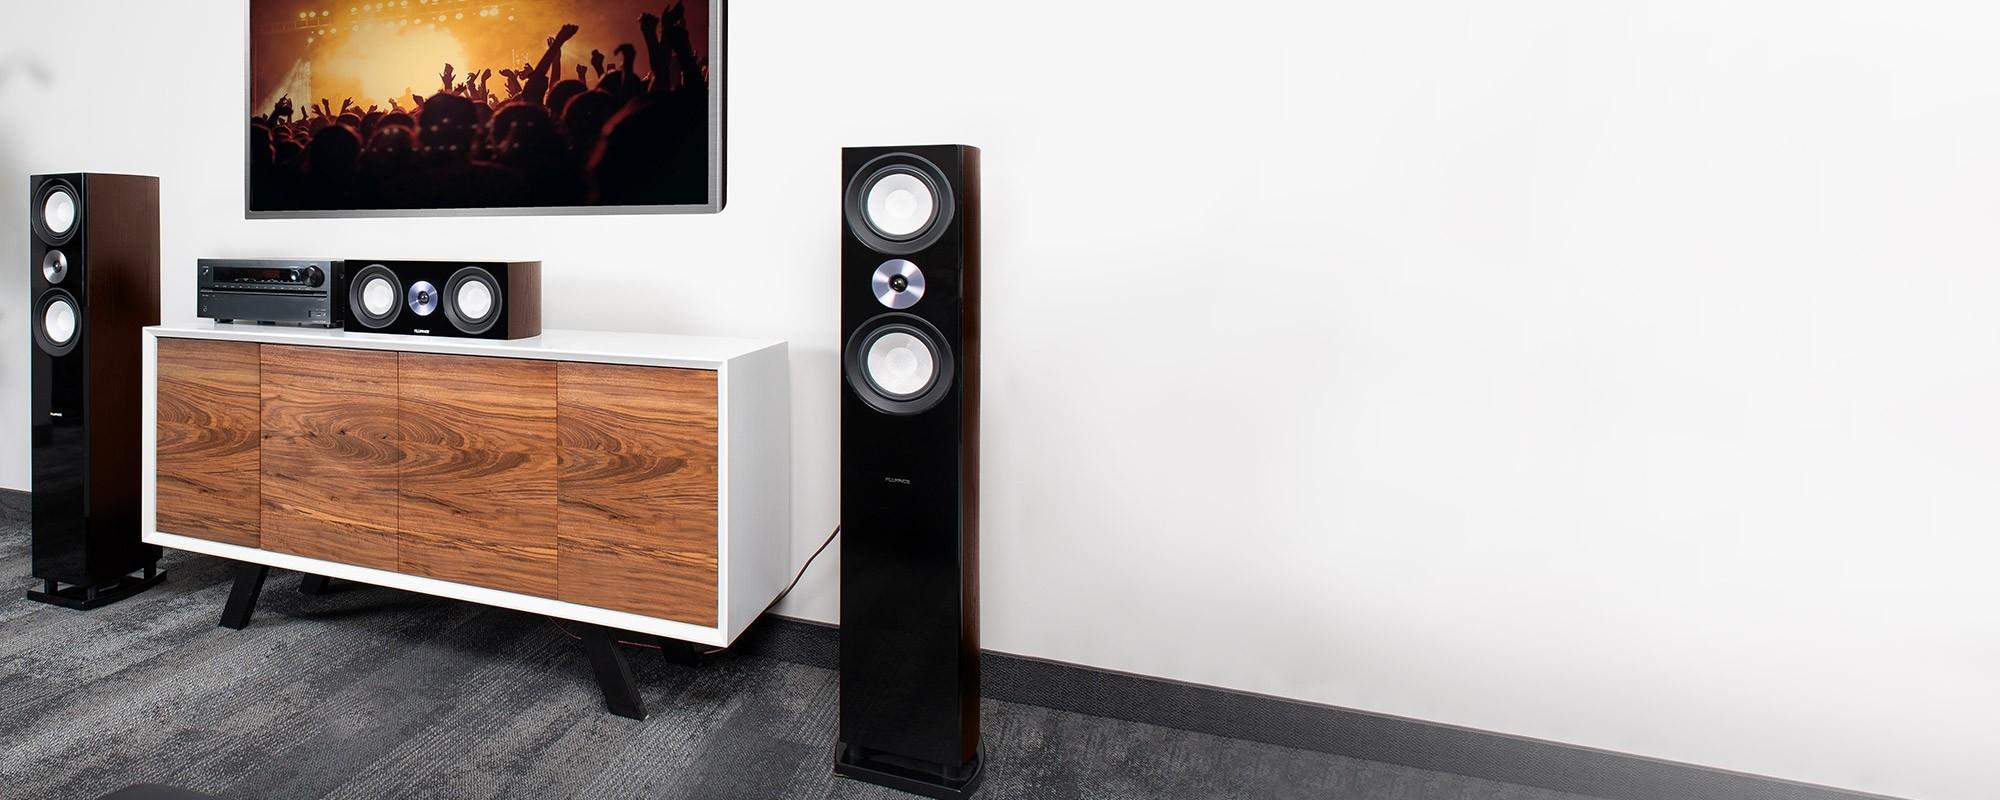 XL8HTBW Home Theater Speaker System Setup